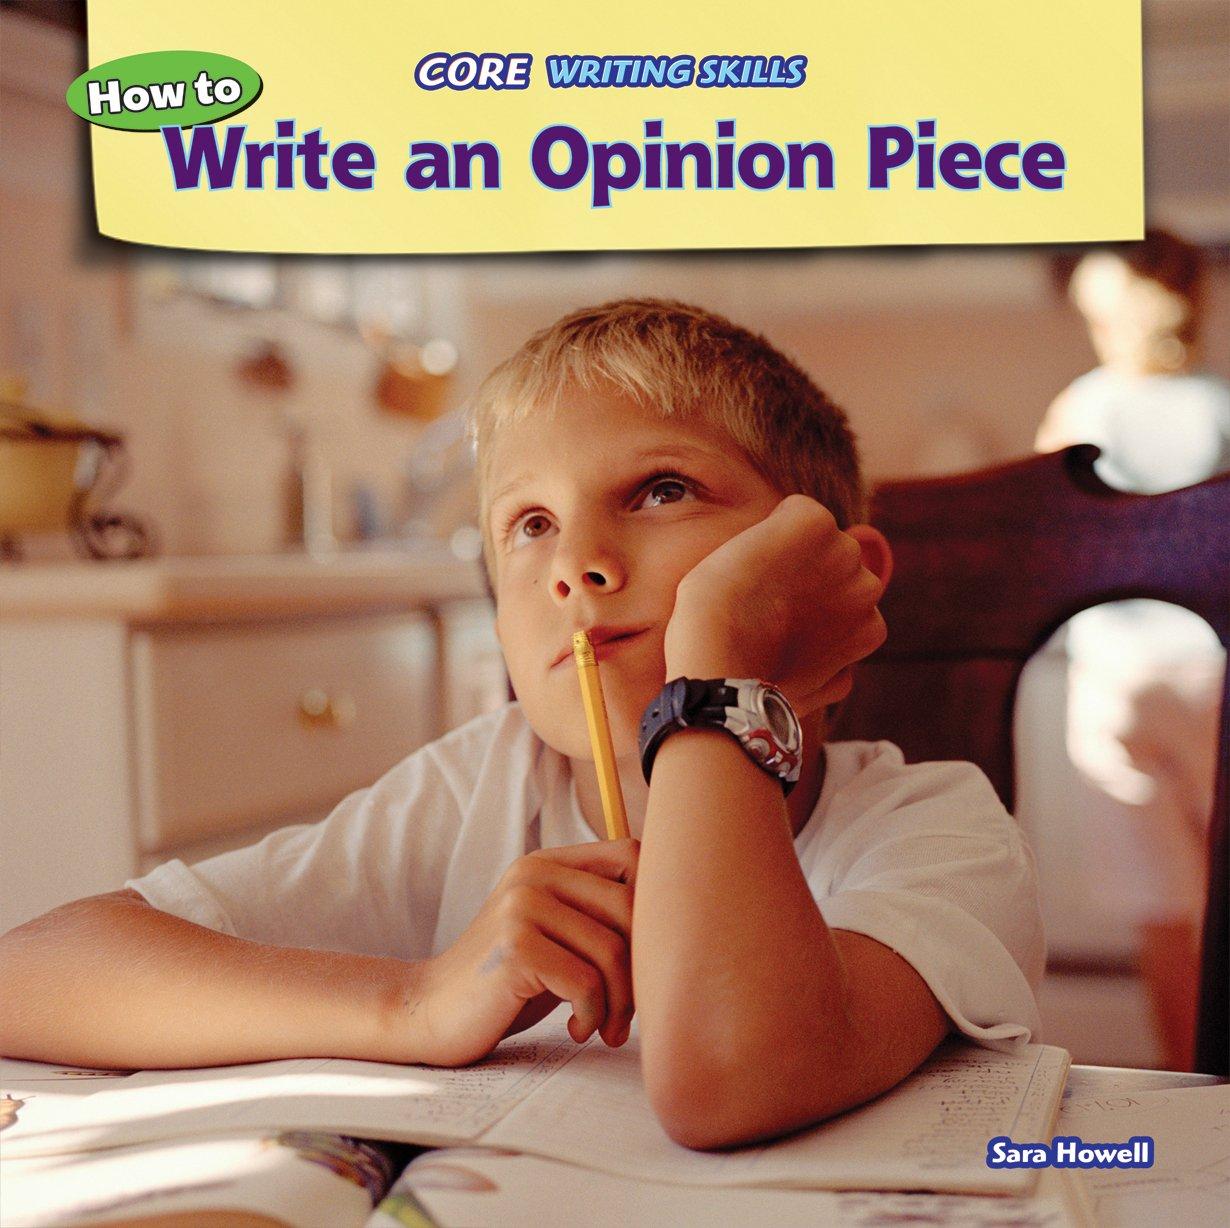 How to Write an Opinion Piece (Core Writing Skills): Amazon.de